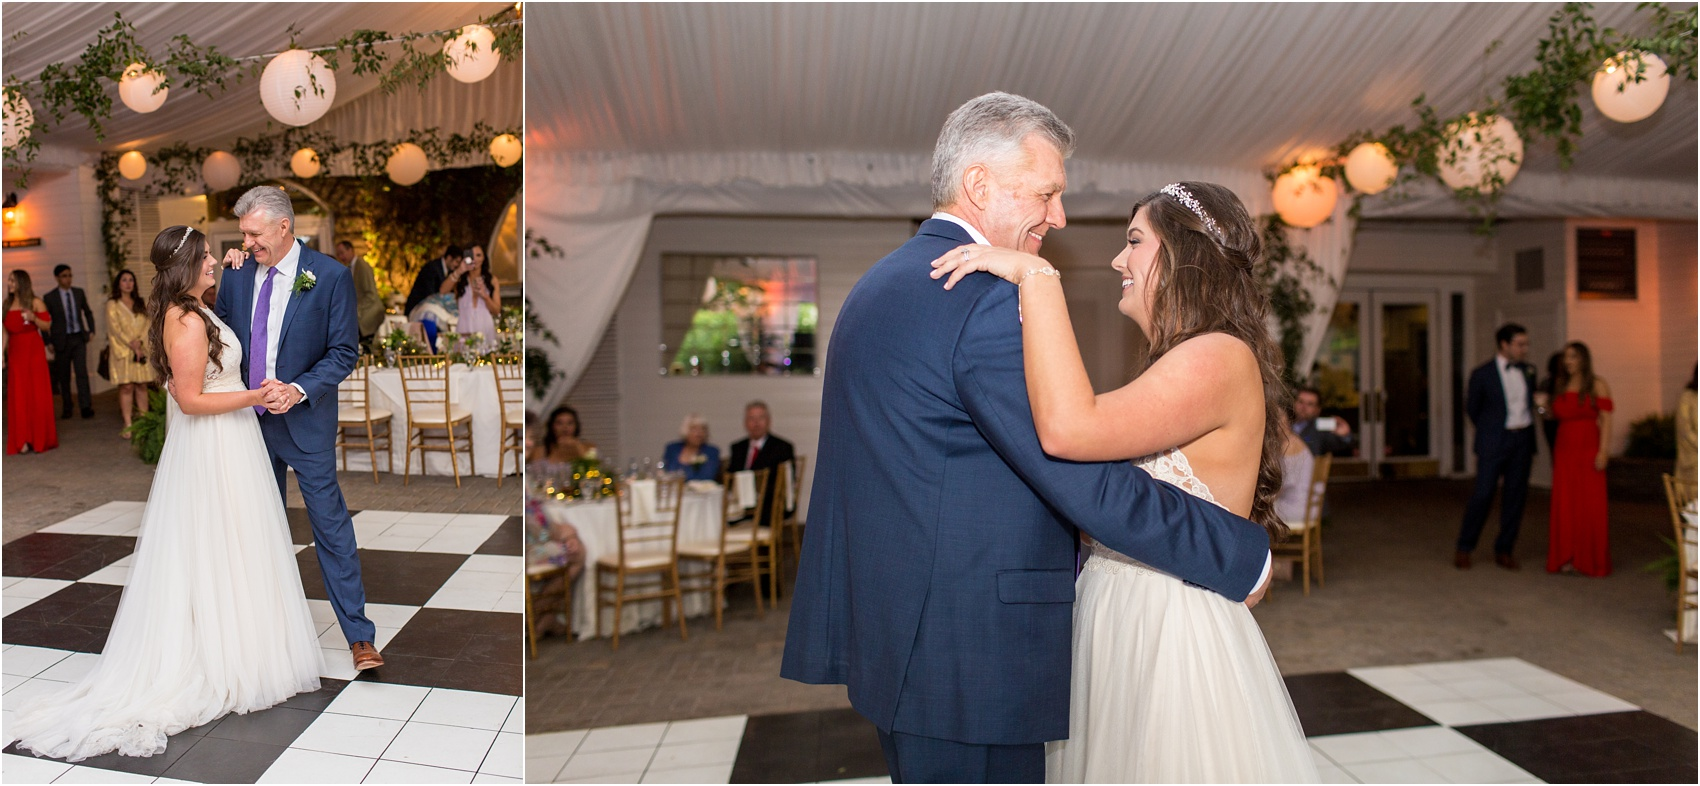 Savannah Eve Photography- Groseclose Wedding- Blog-92.jpg